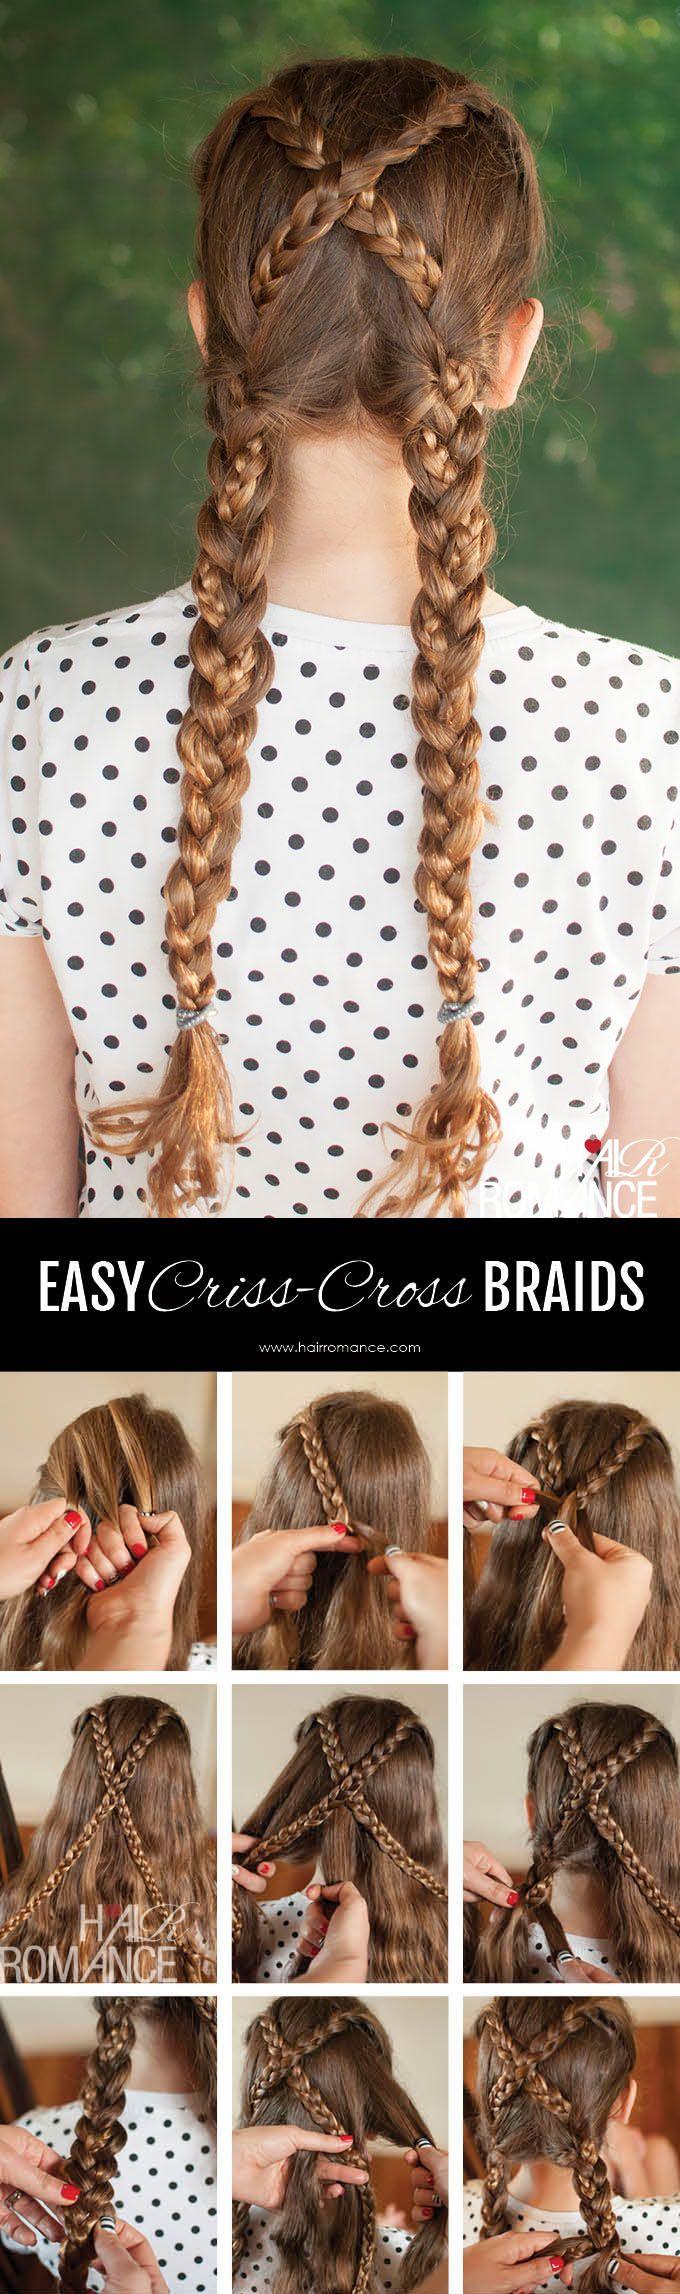 How to grow long healthy hair school hair braid hairstyles and